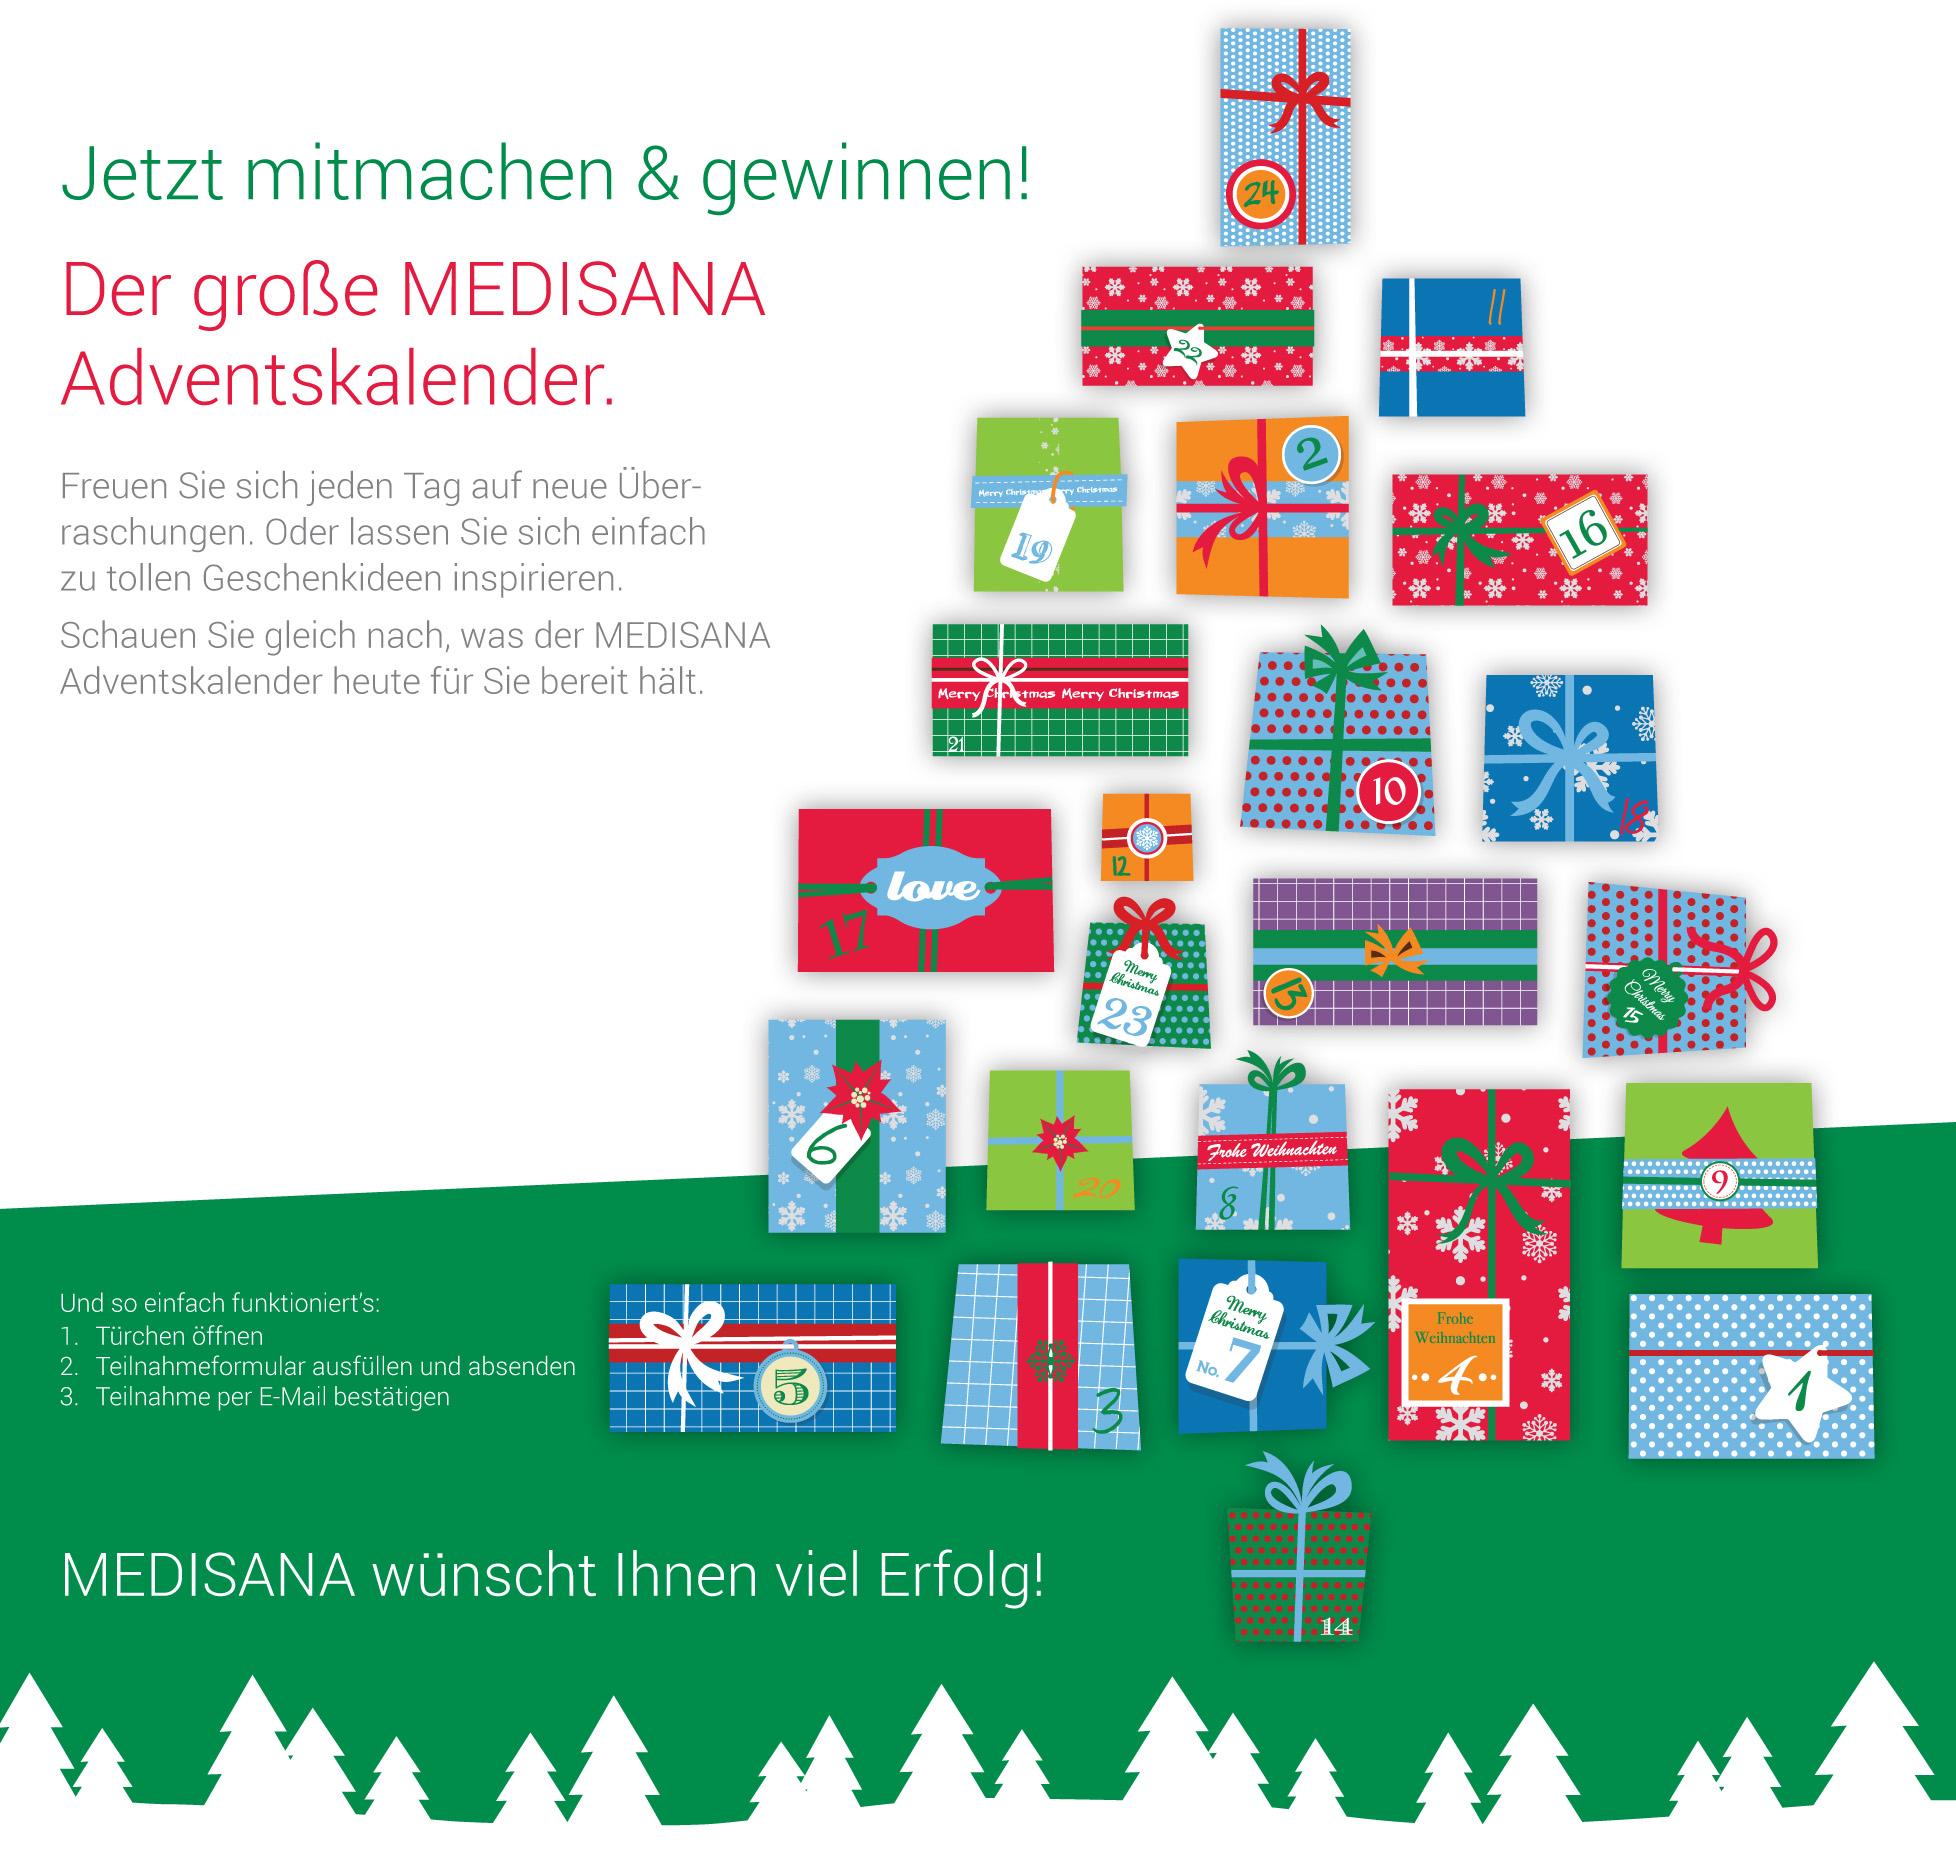 medisana online adventskalender 2016